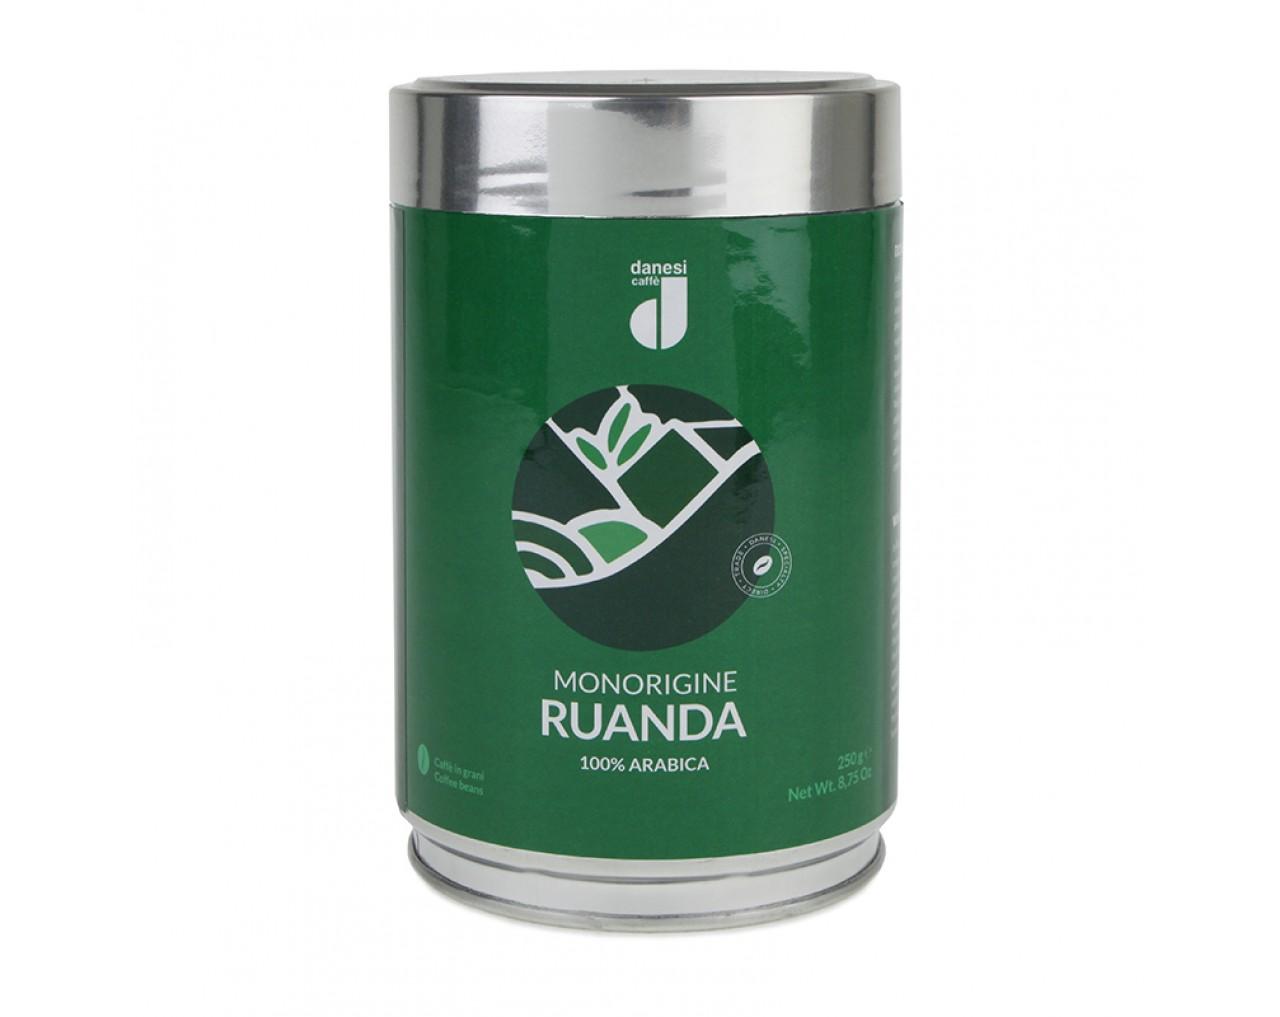 Danesi 100% Arabica Ruanda Single Origin (tin)